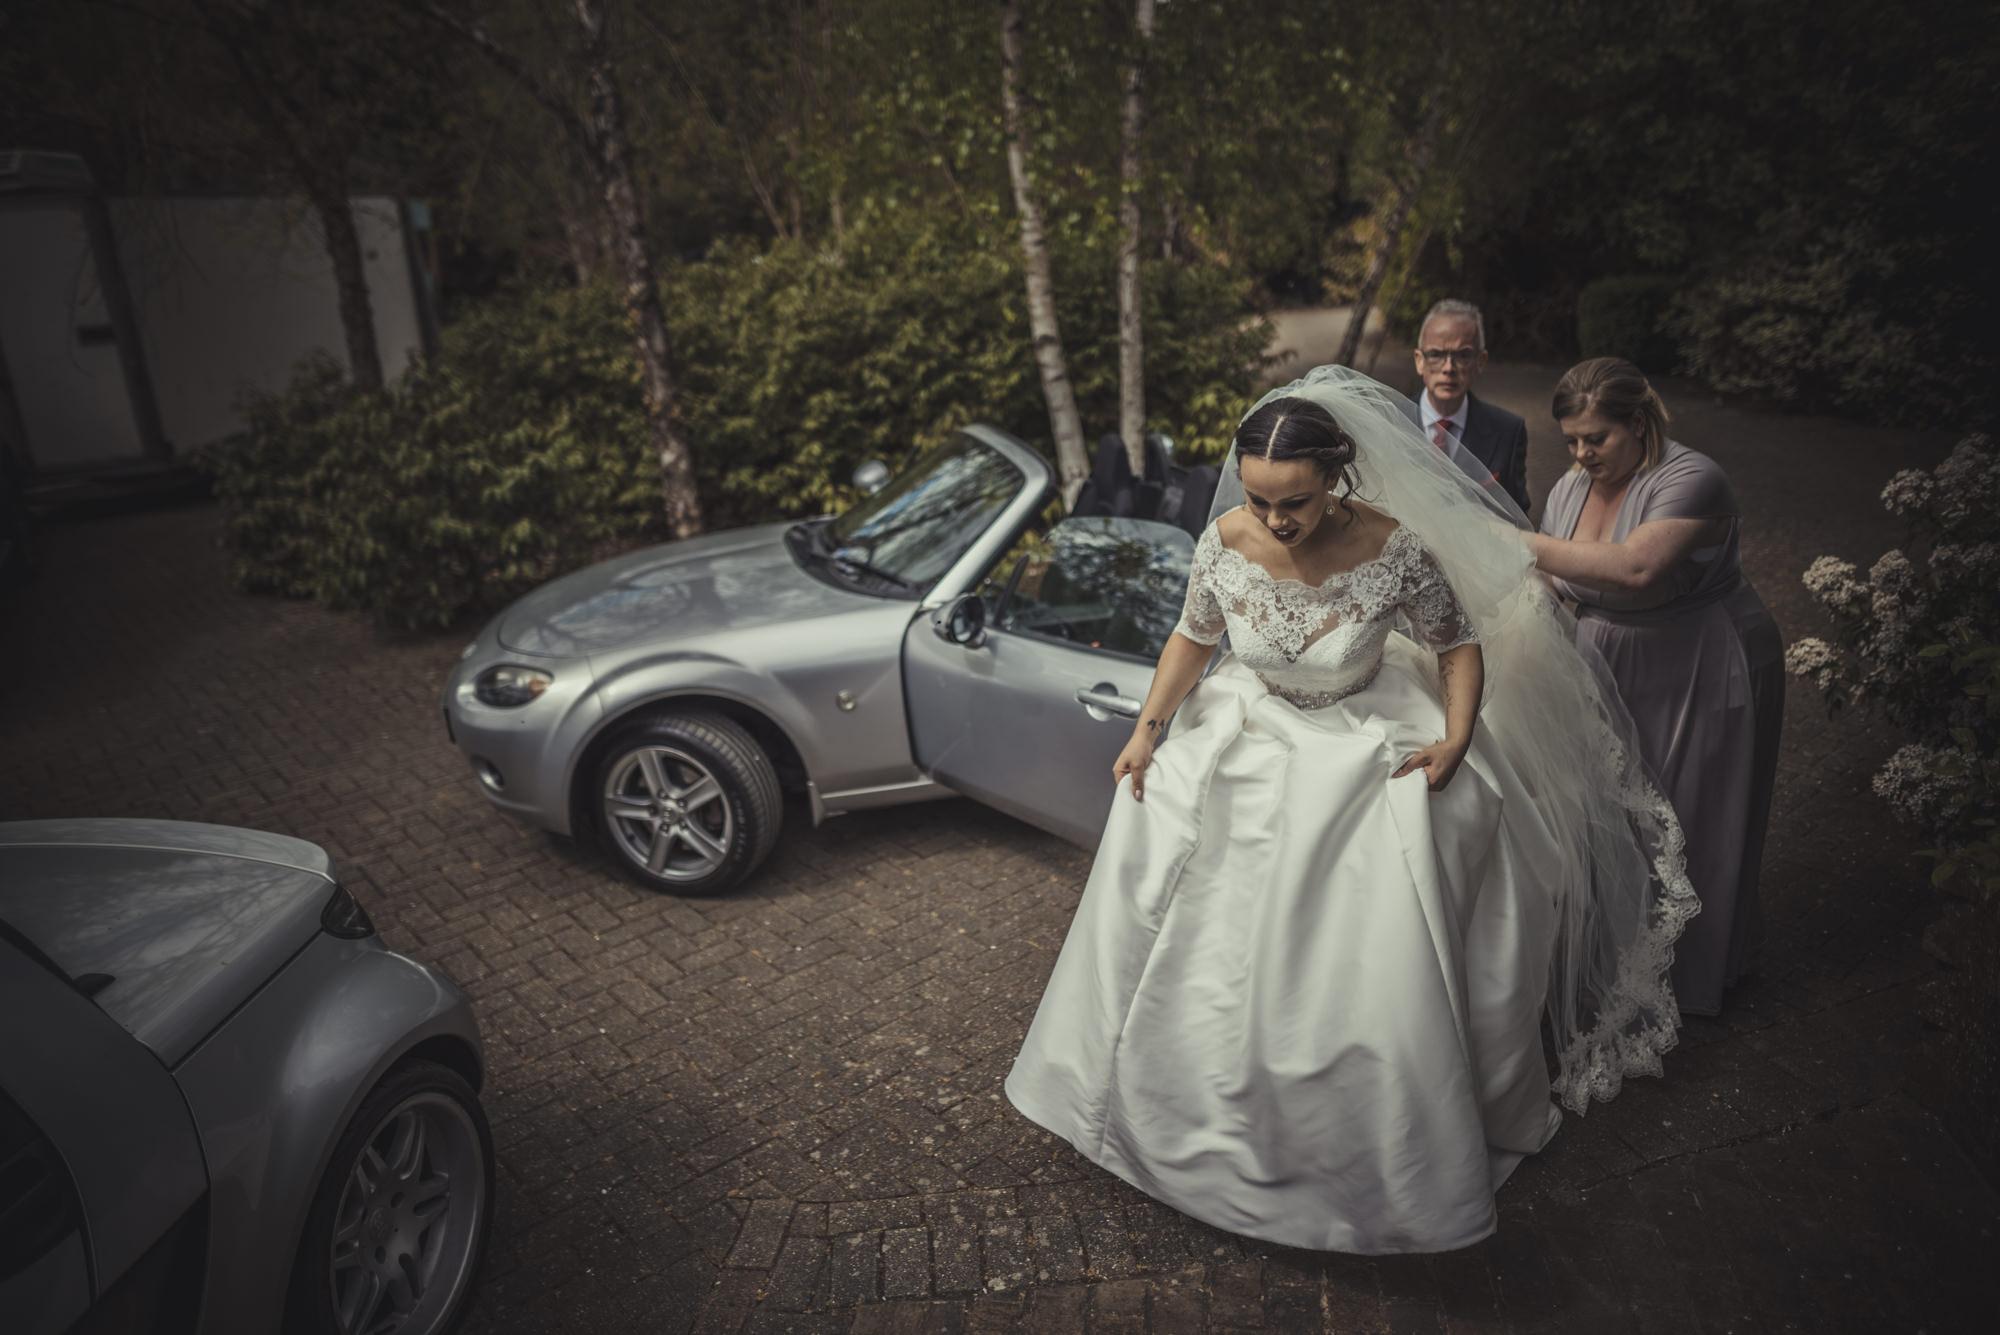 Jacqueline-Gareth-Wedding-Westmead-Events-Surrey-Manu-Mendoza-Wedding-Photography-168.jpg